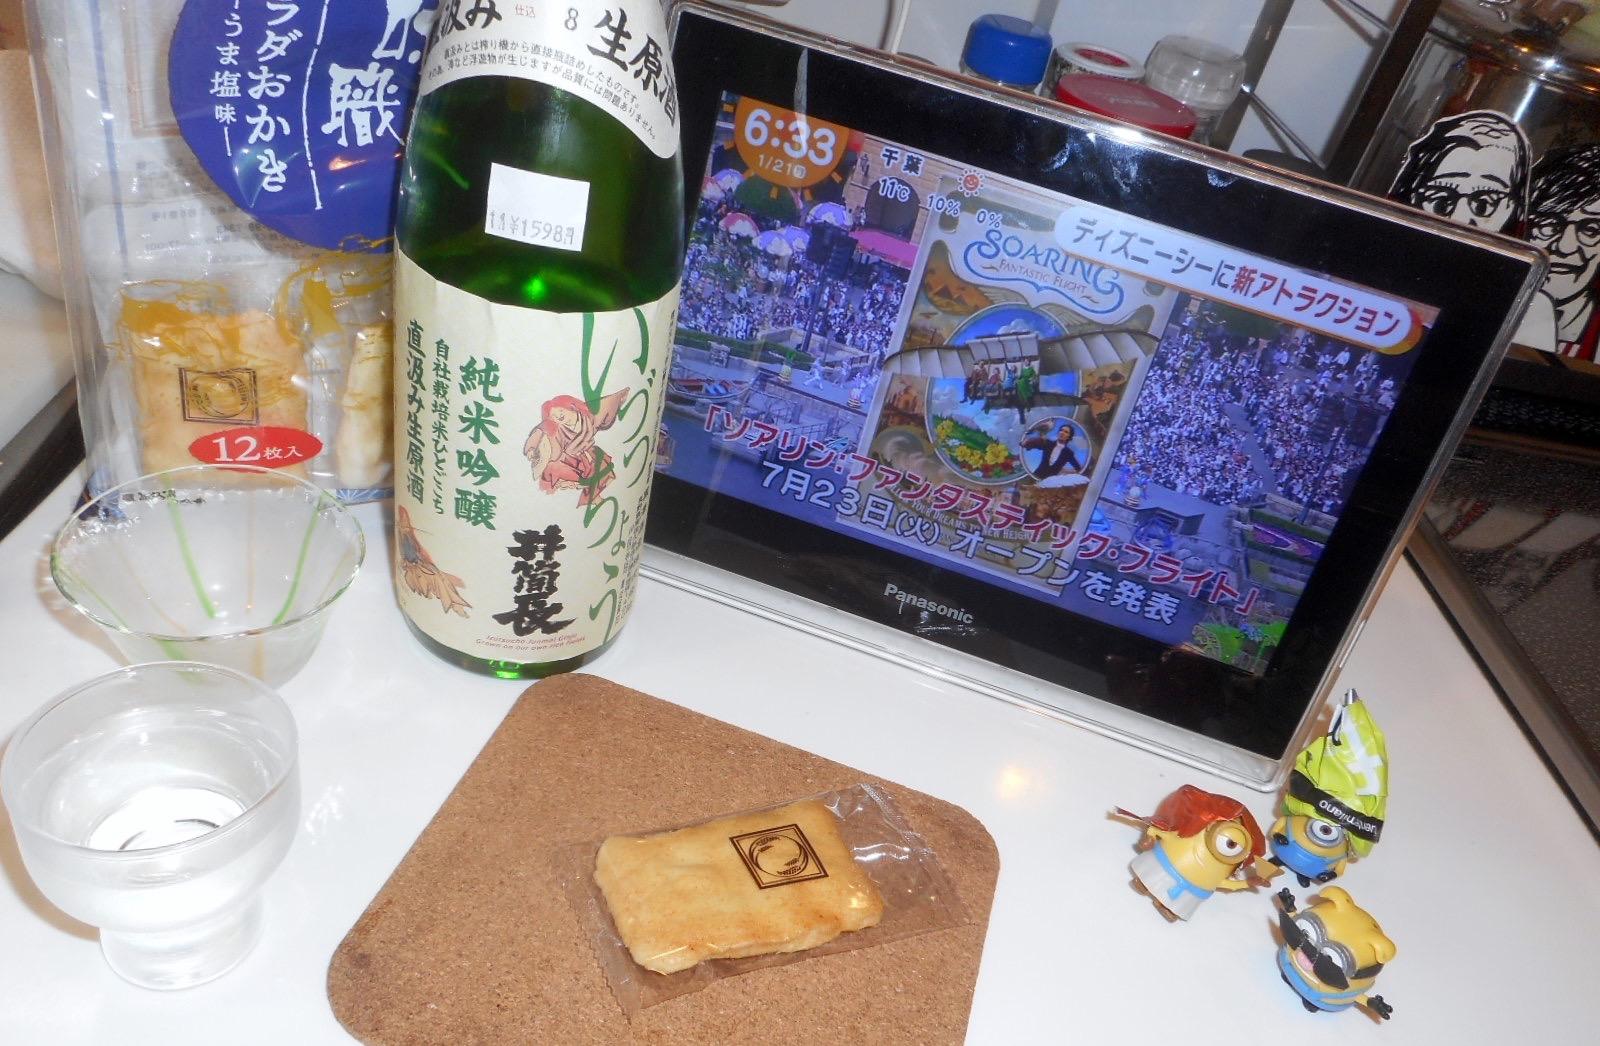 izutsuchou_jikagumi30by1_5.jpg